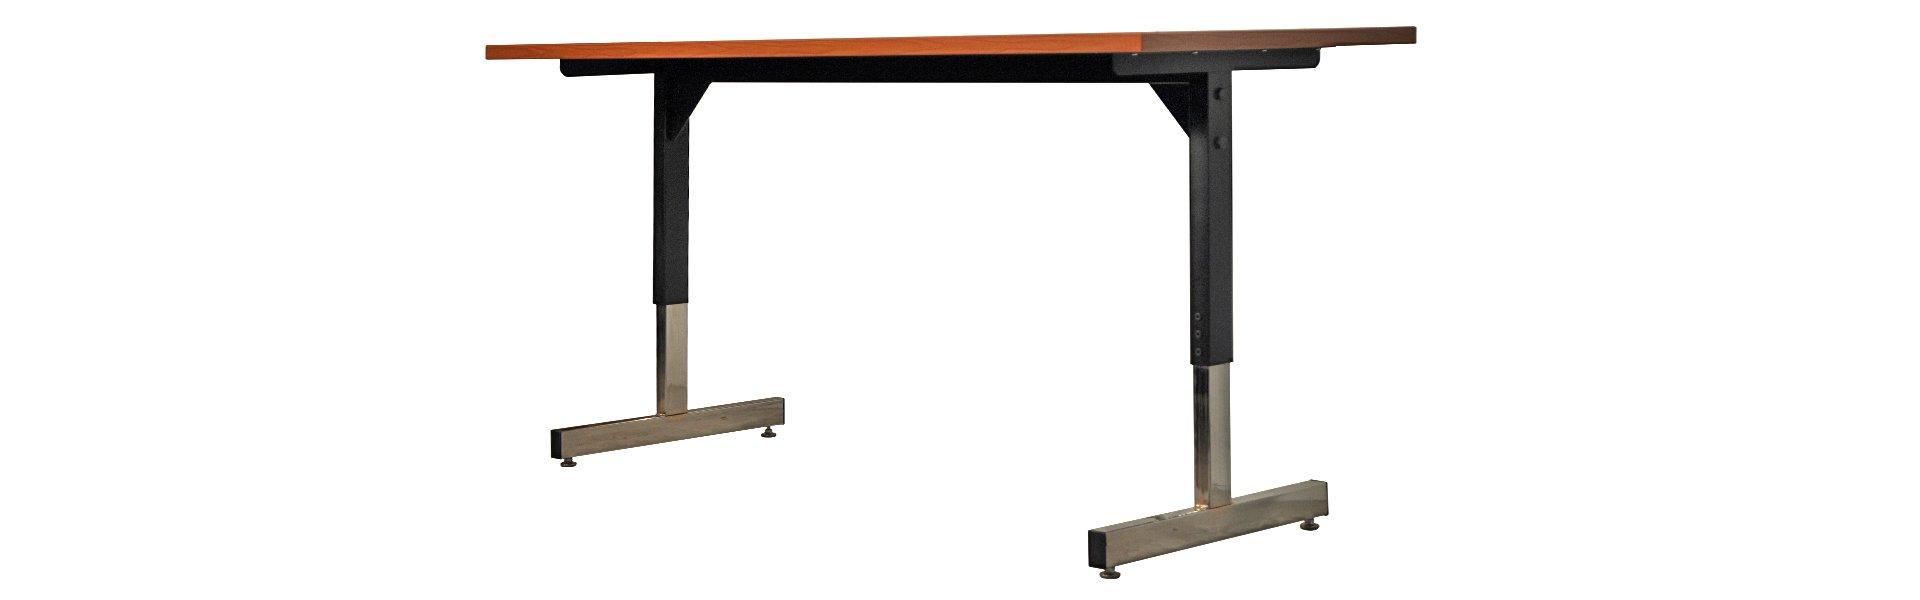 Corilam 615 Table